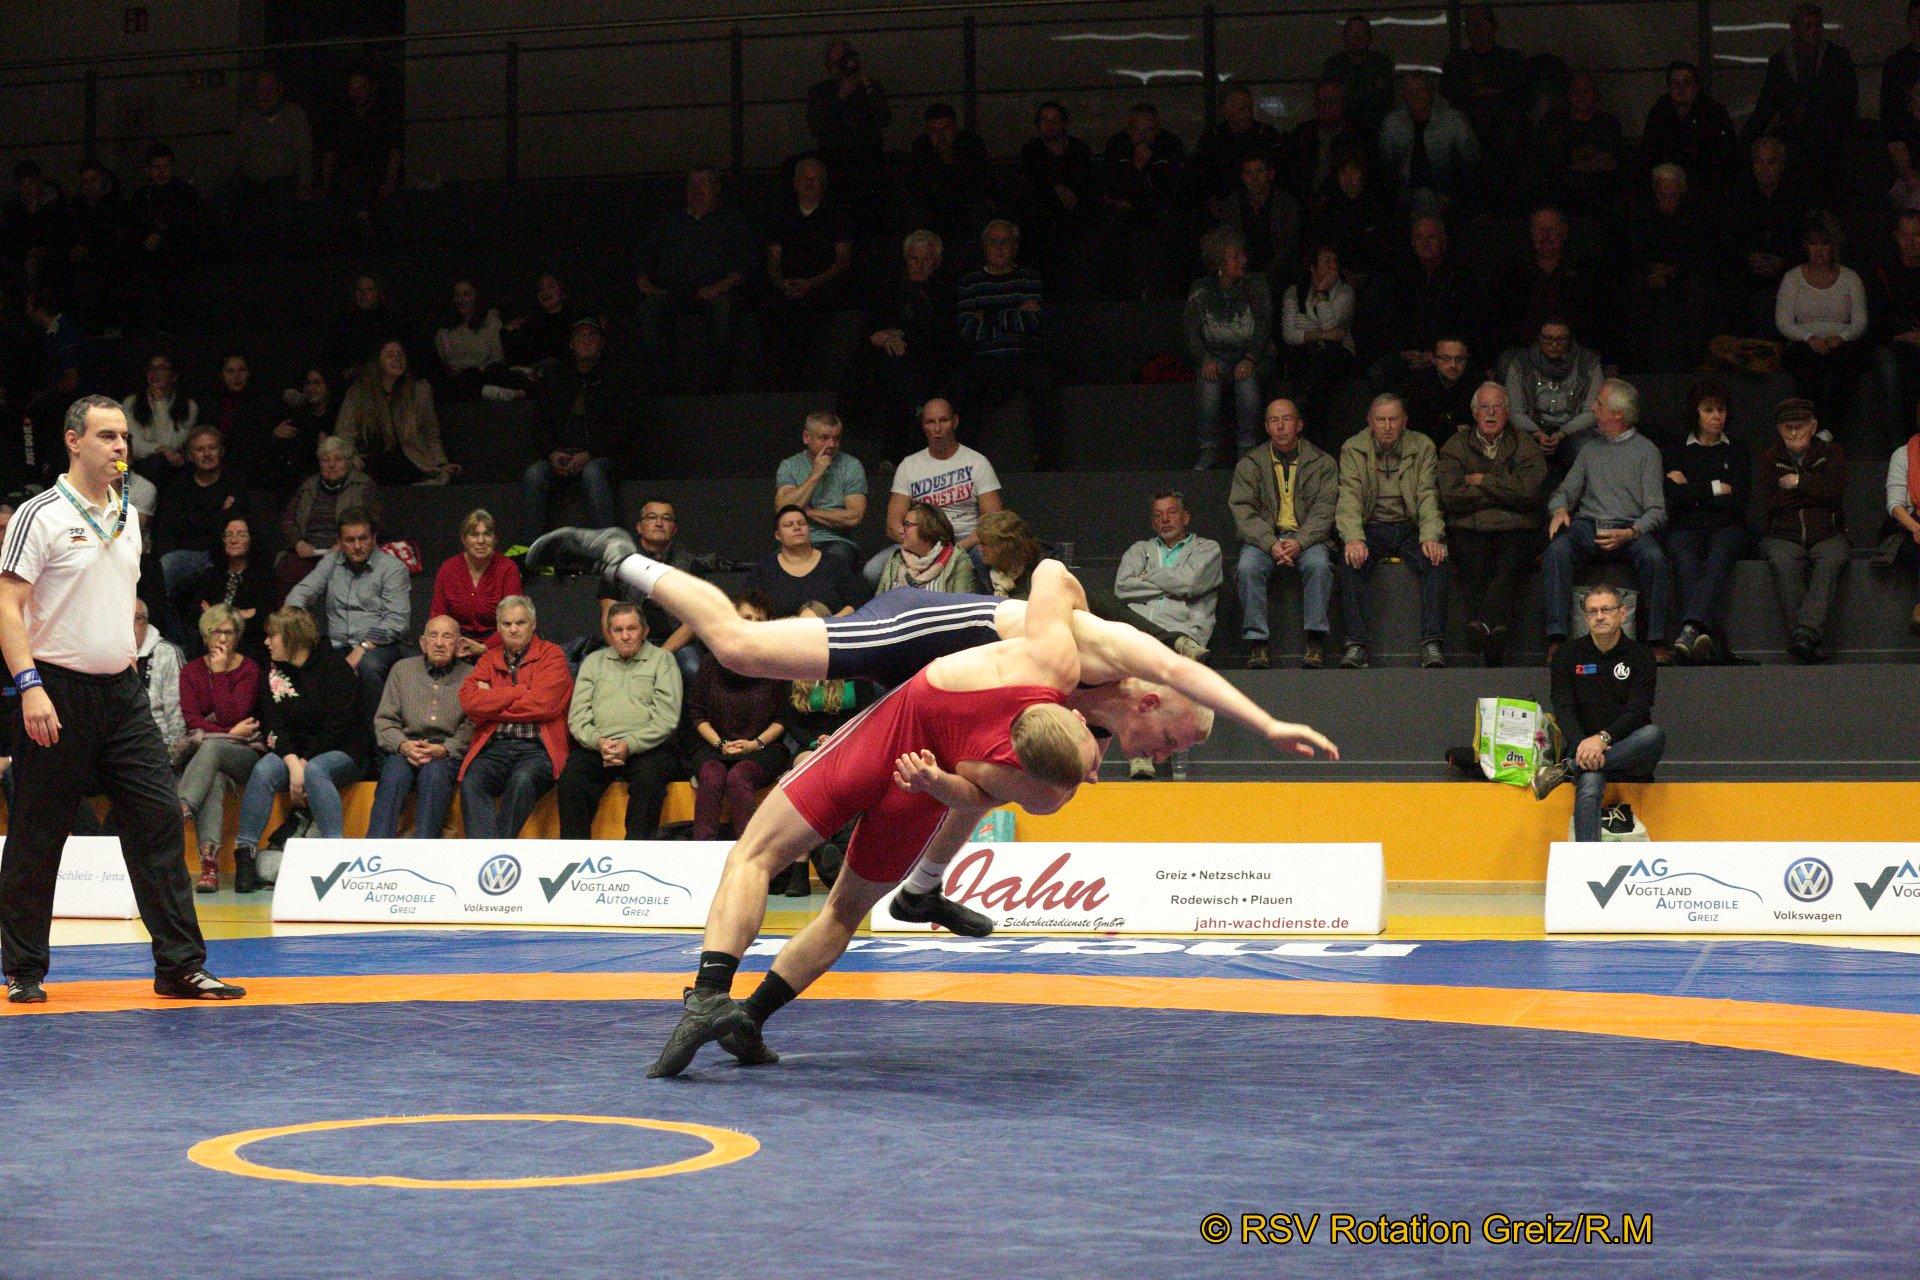 72kg Greco: Ron Watzek (rotes Trikot), RSV Rotation Greiz II gegen Felix Mende, AC 1990 Taucha 4:0/SS/4:0/00:35